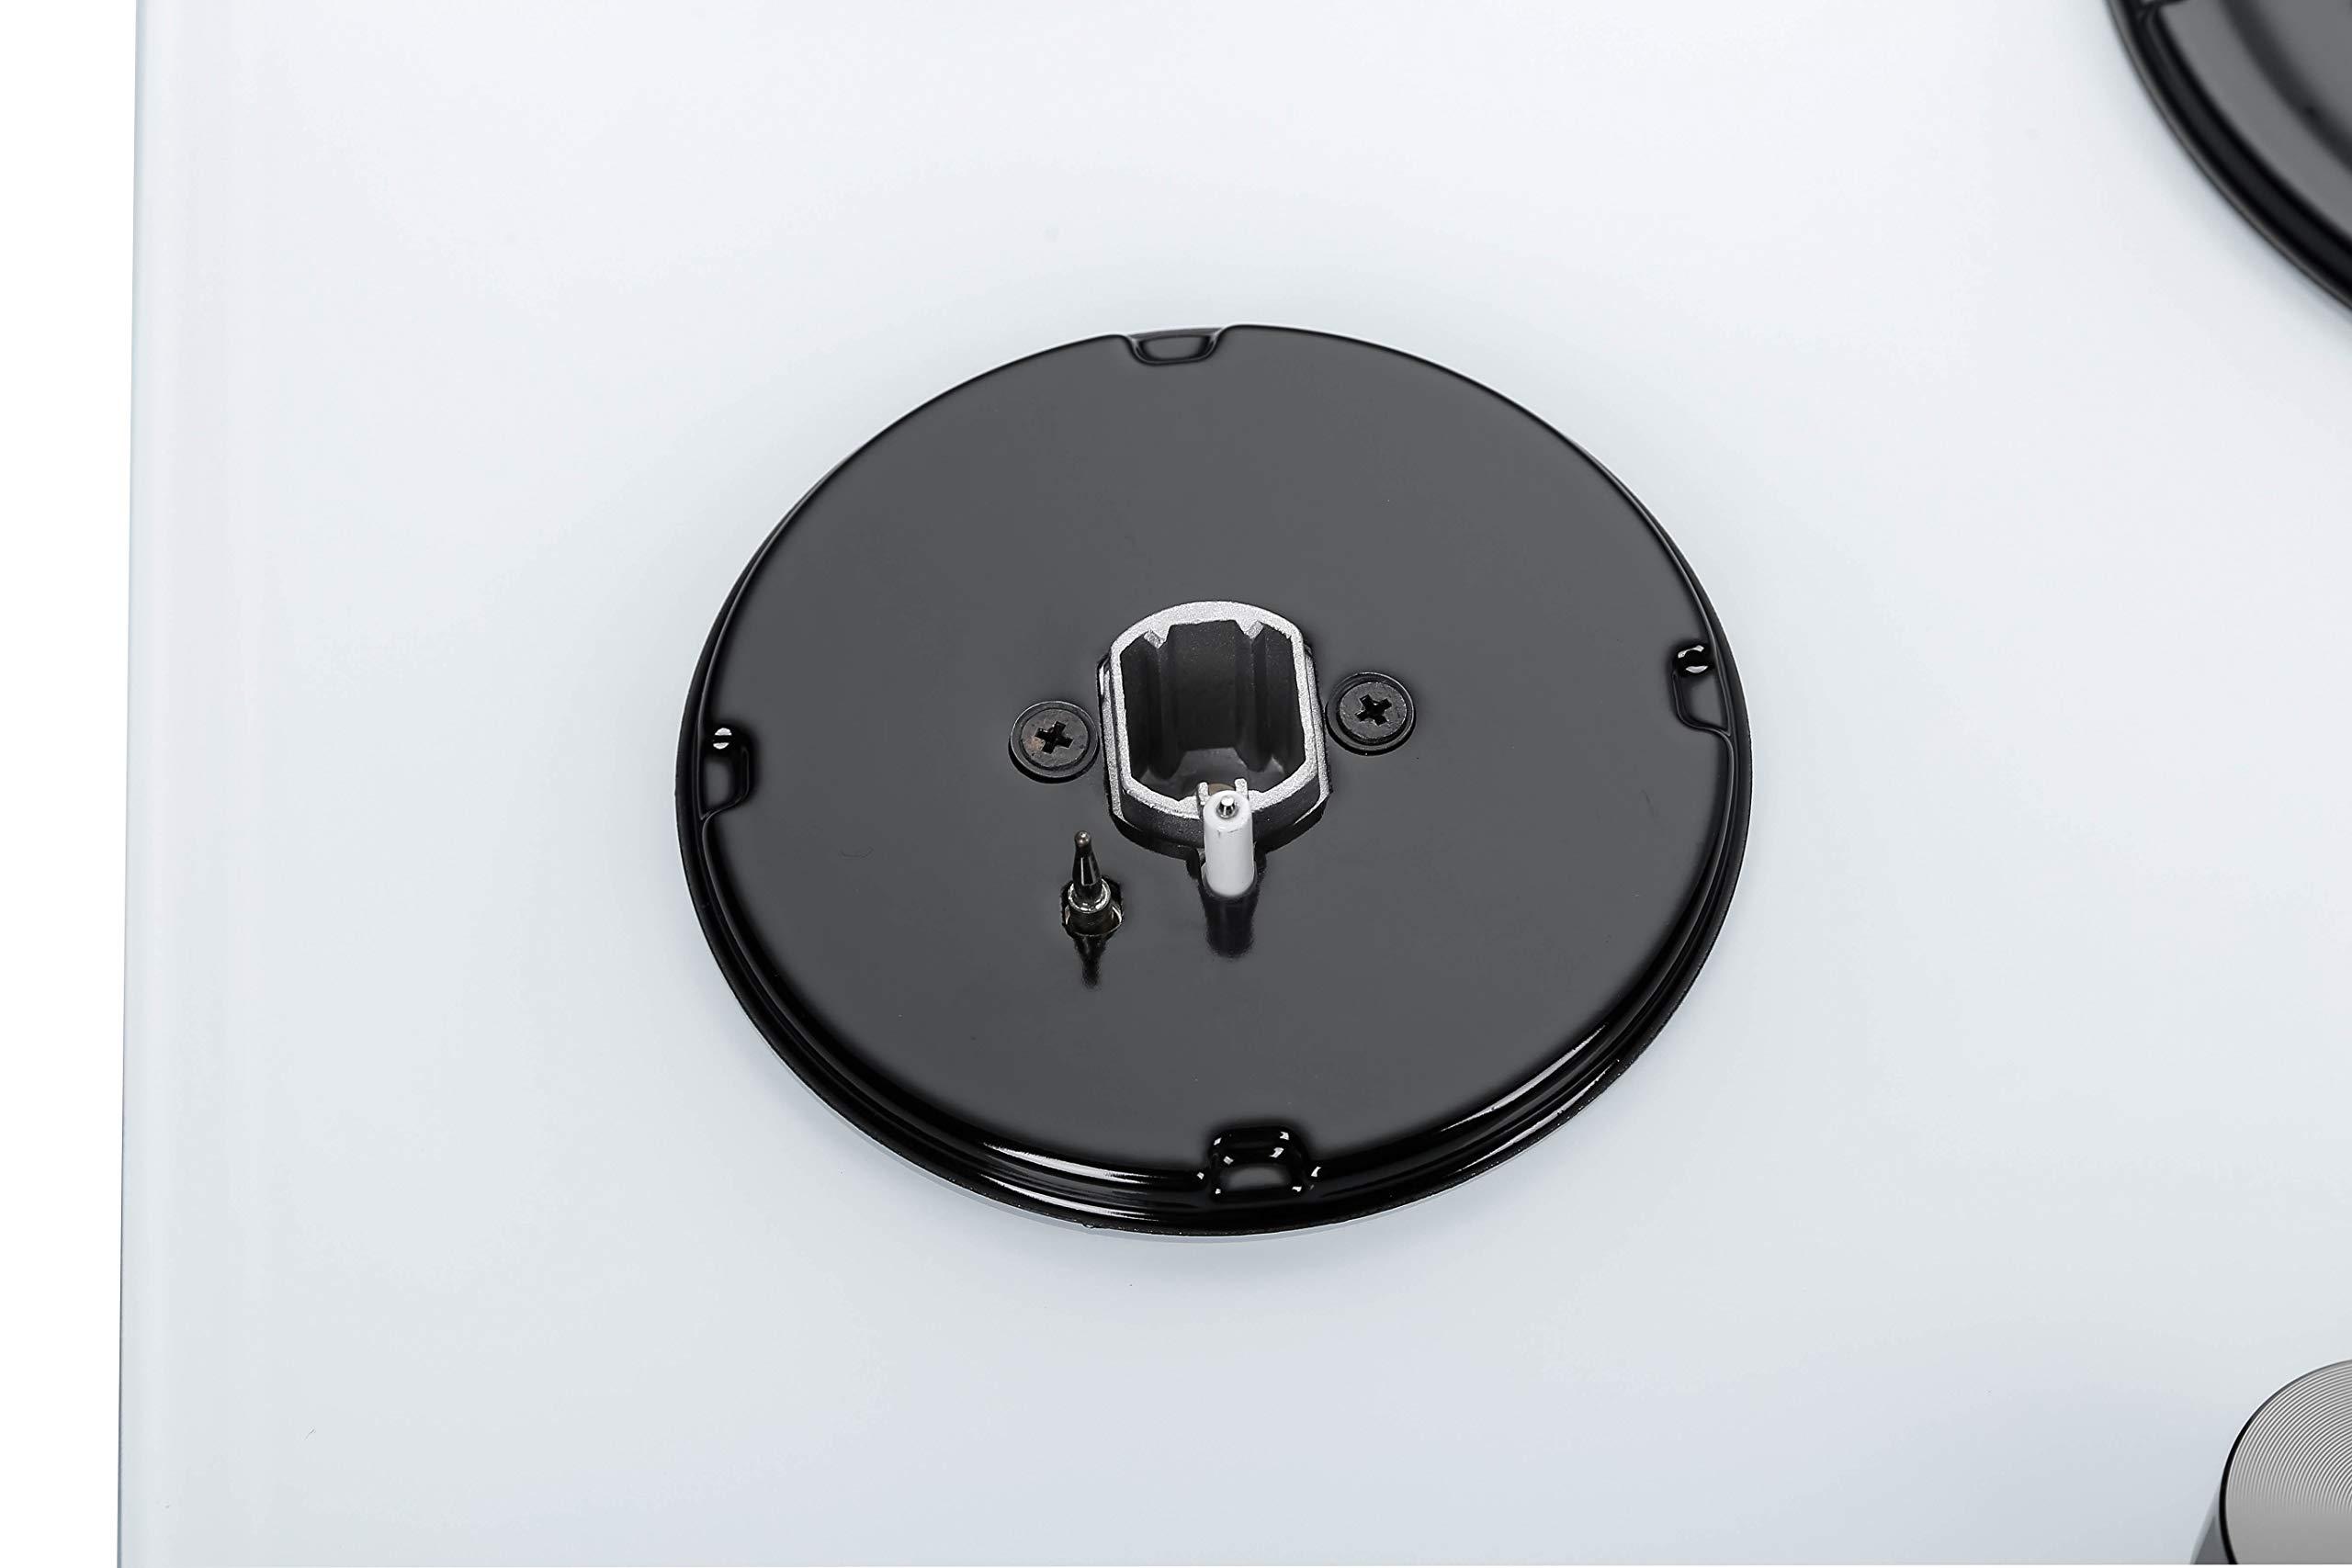 71GpWuYtbgL - Millar GH7051PW Tempered Glass Hob With 5Gas Burners 70 Cm, White